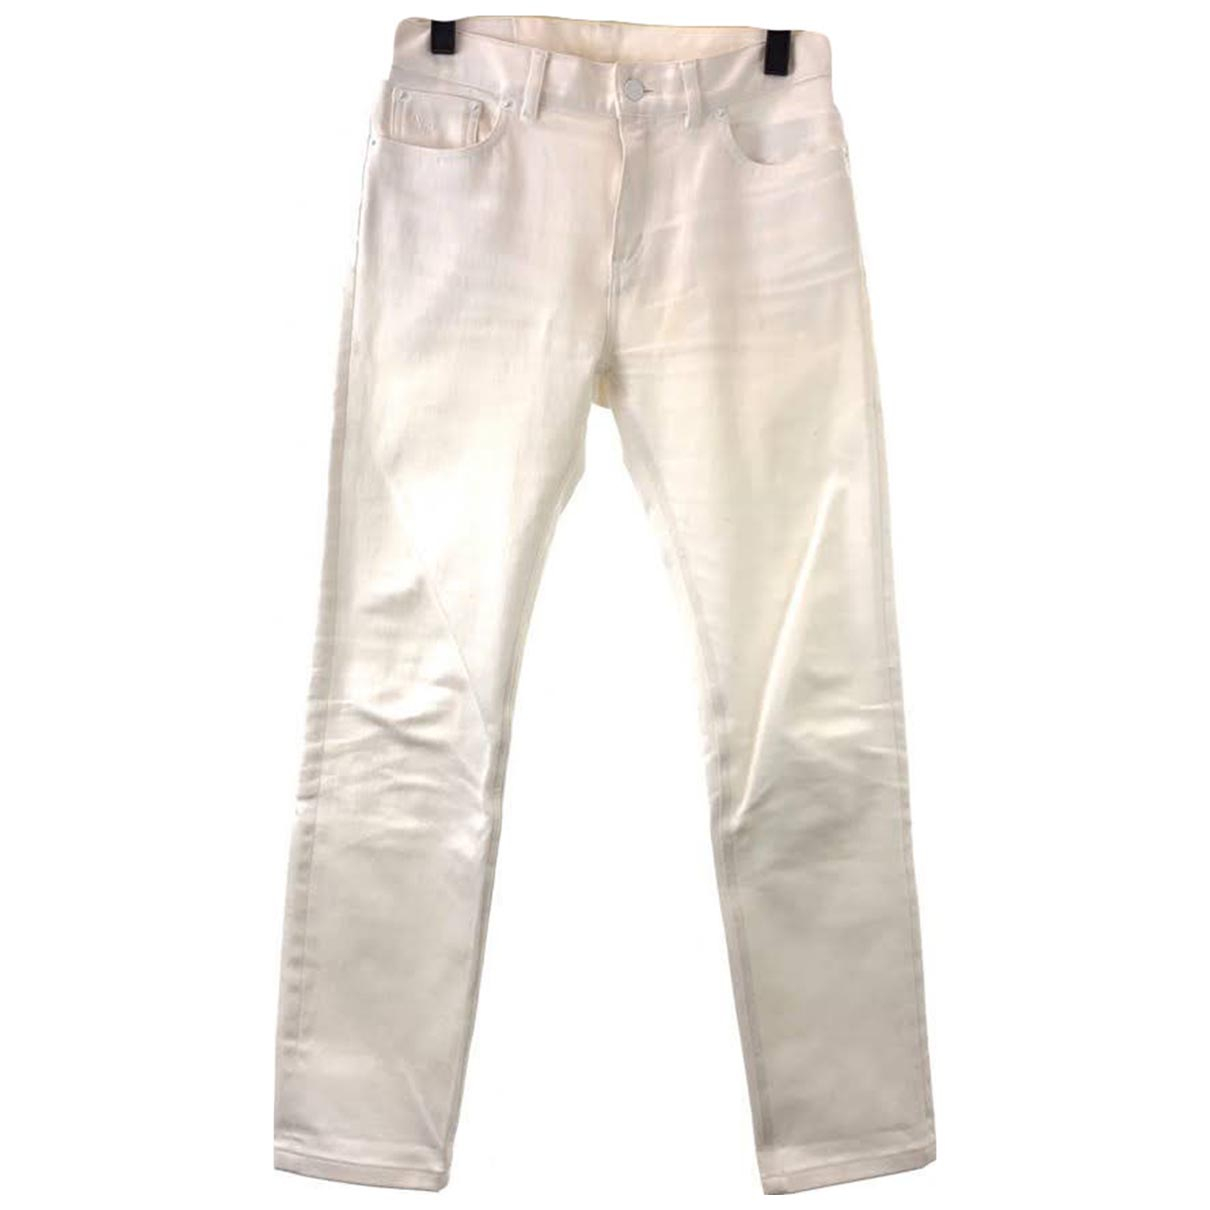 Pantalones en Algodon Louis Vuitton